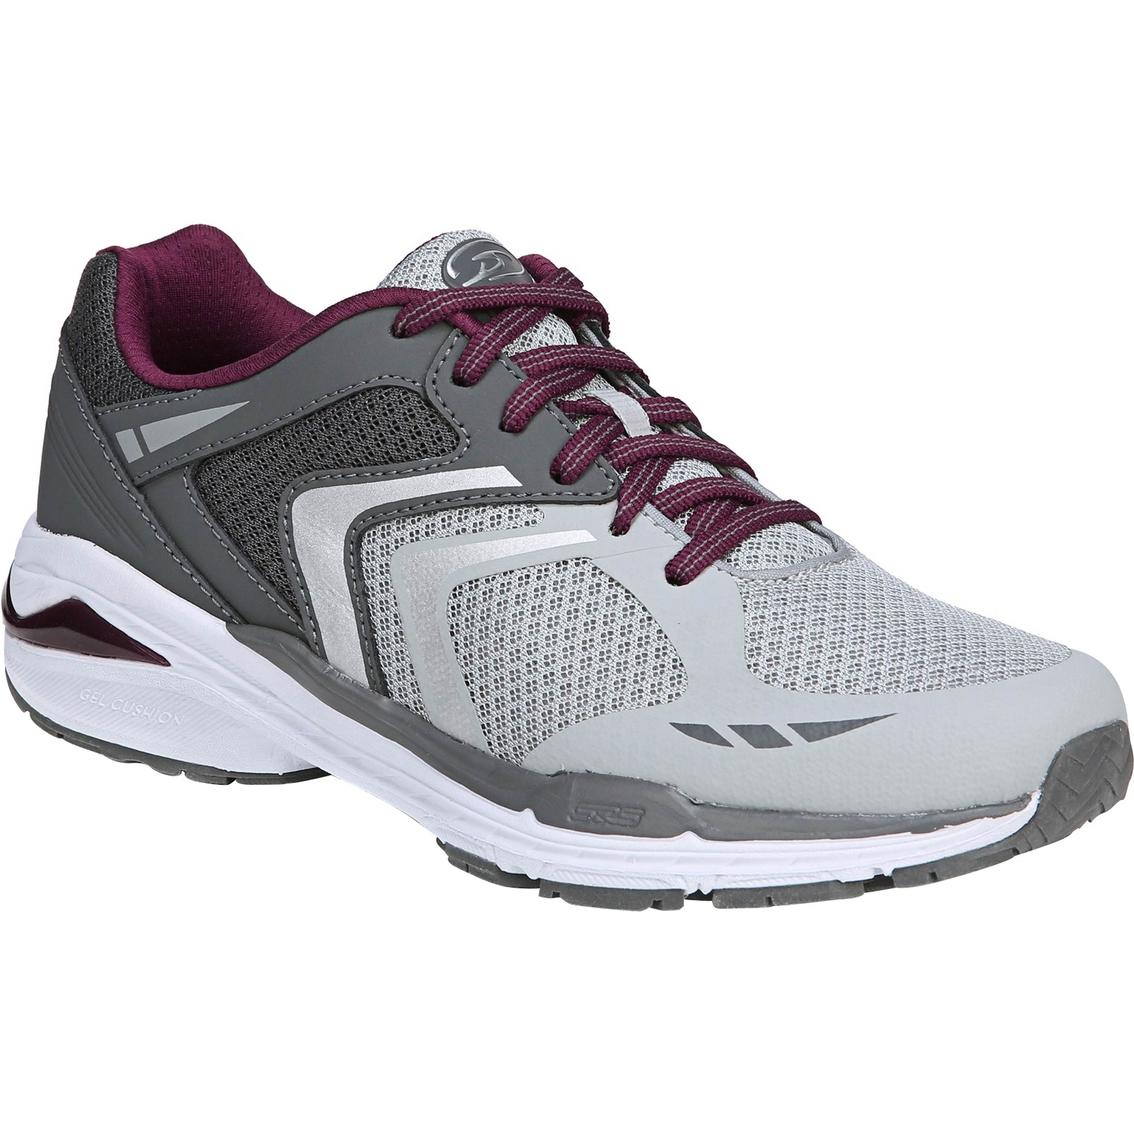 25012e3c82b Dr. Scholl s Blitz Sneakers